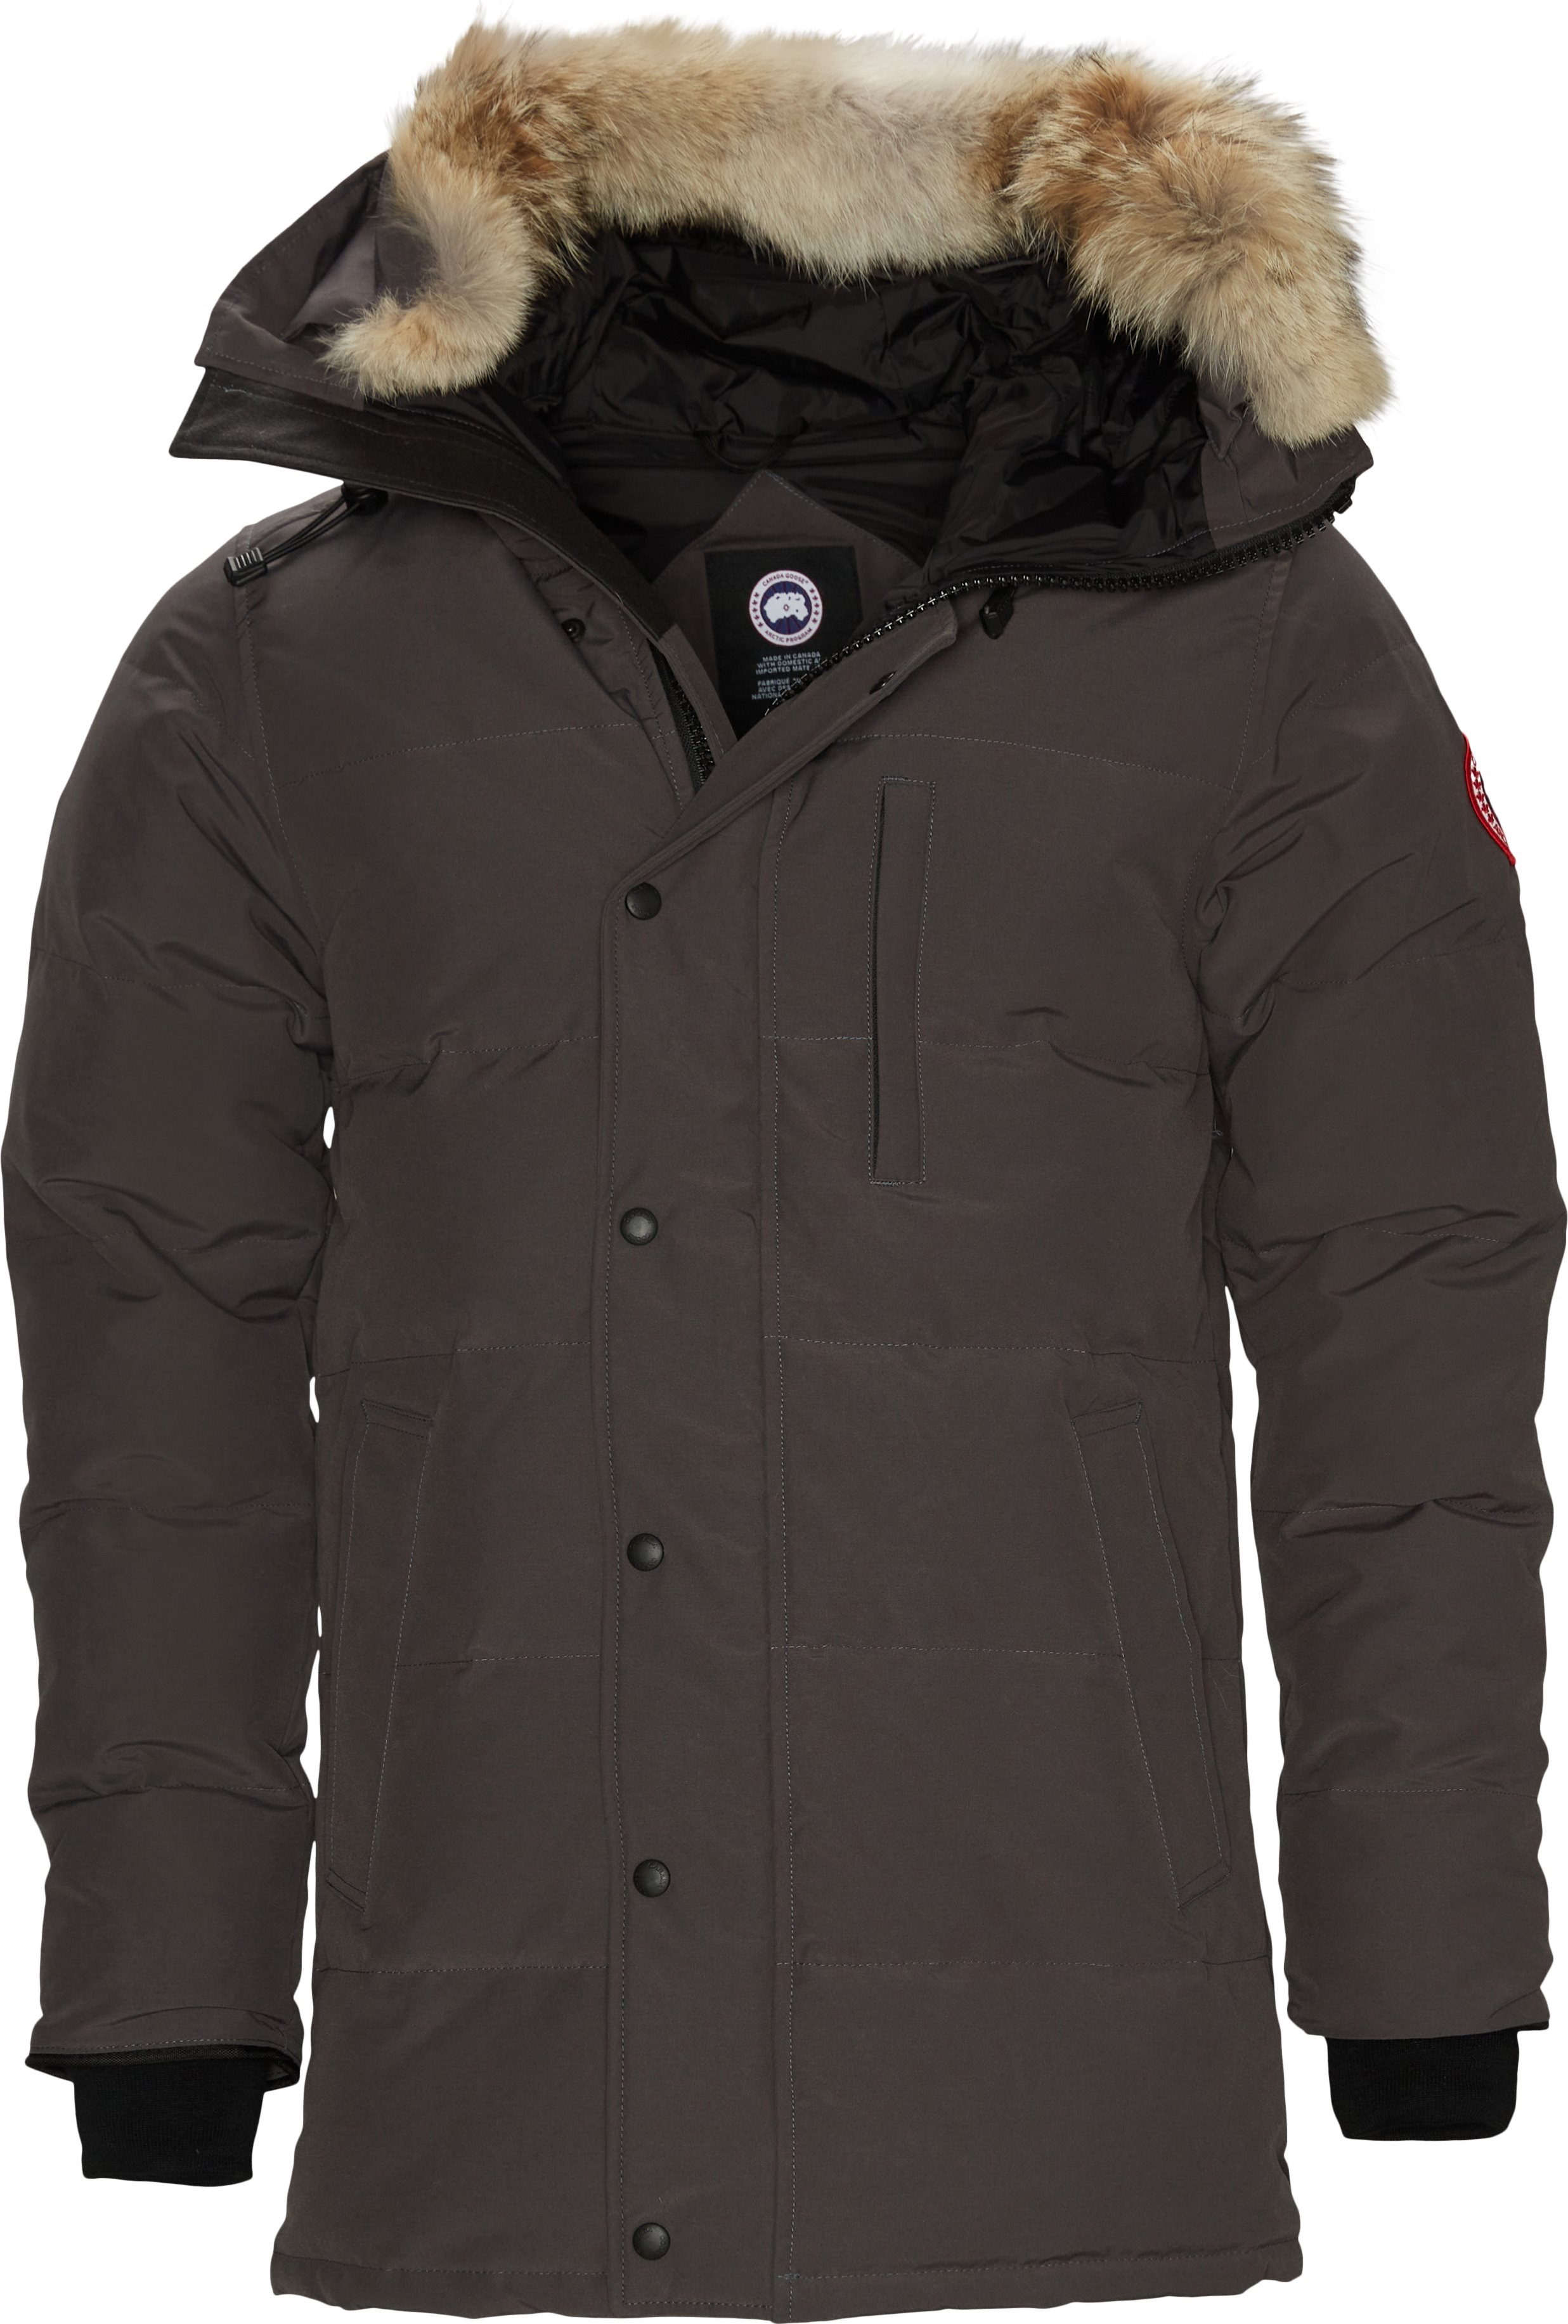 Jackets - Regular fit - Grey